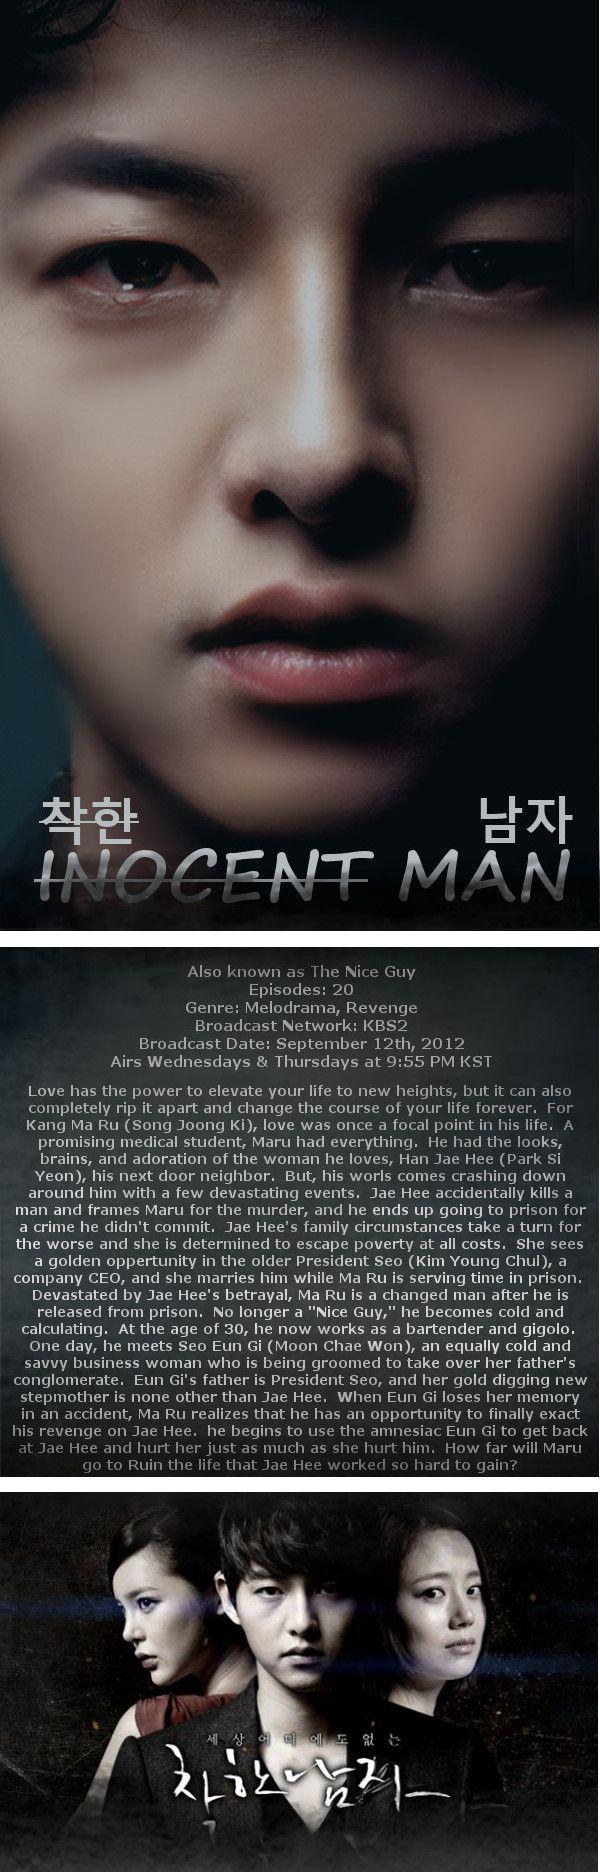 An Innocent Man aka The Nice Guy - 20 episodes (2012) *Lee Sang Yeob, *MOON CHAE WON, *SONG JOONG KI, *Park Si Yeon ( stars)